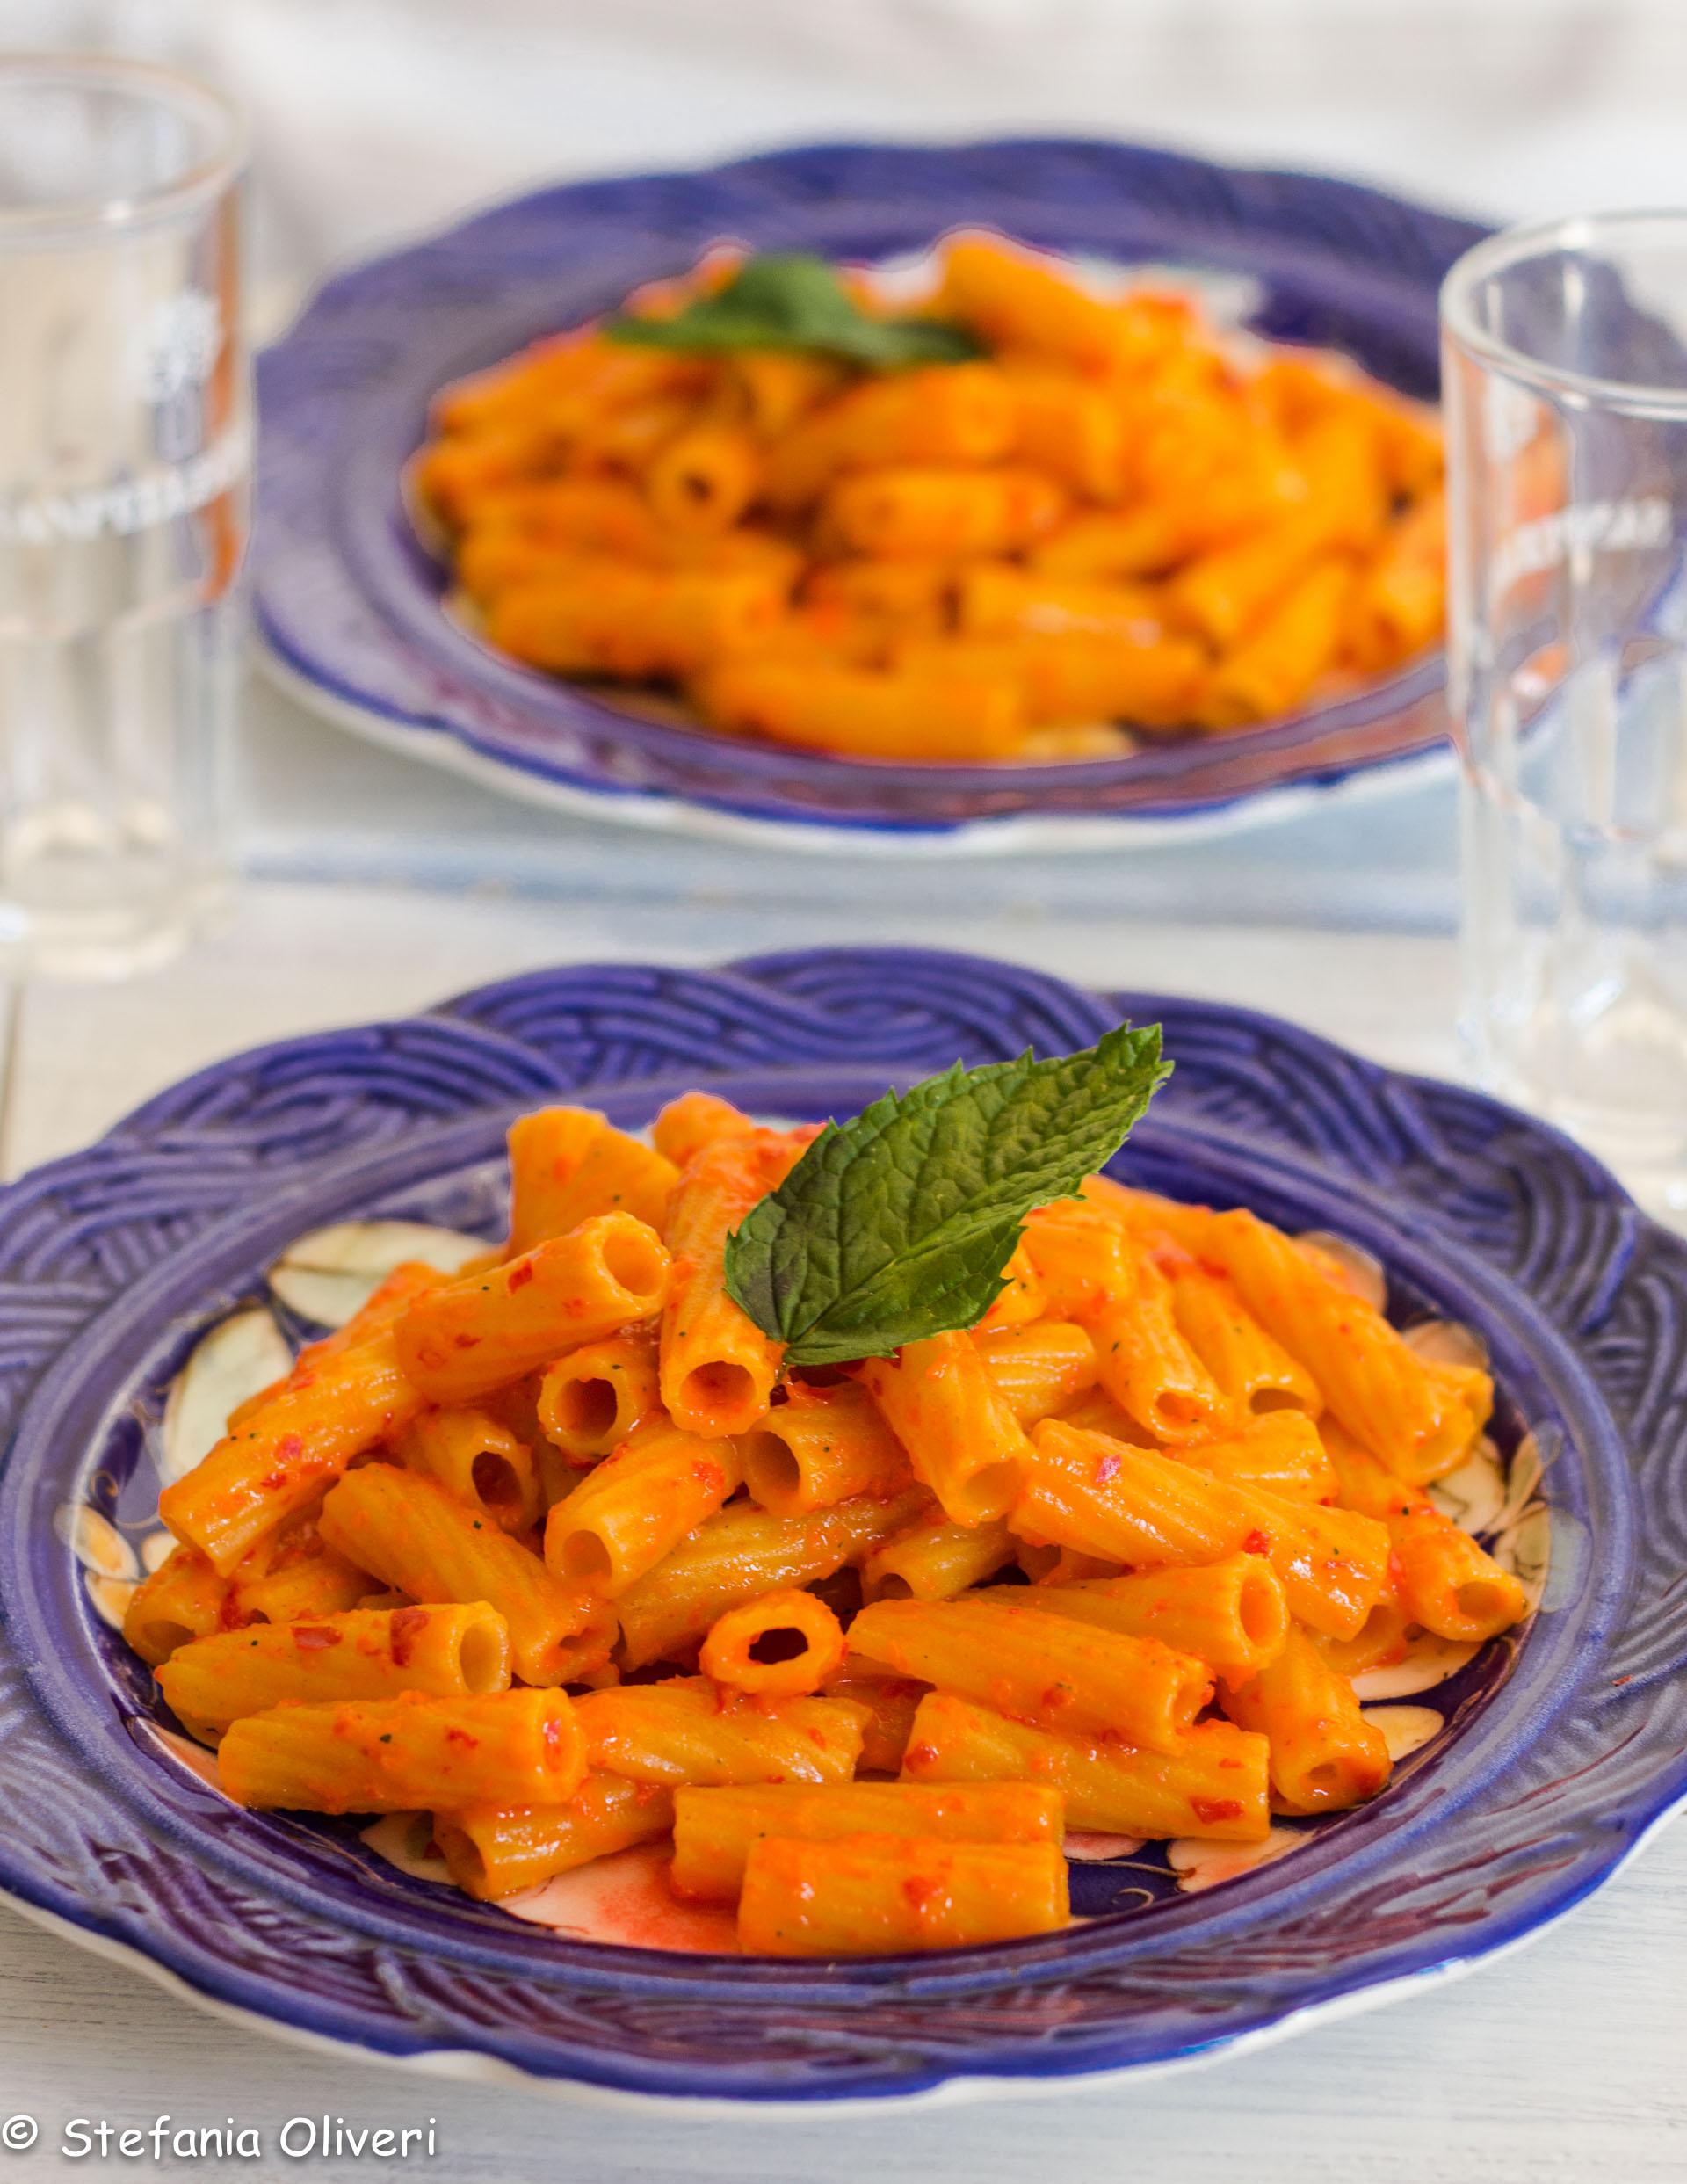 Pasta ai cereali con salsa al peperone crudo - Cardamomo & co